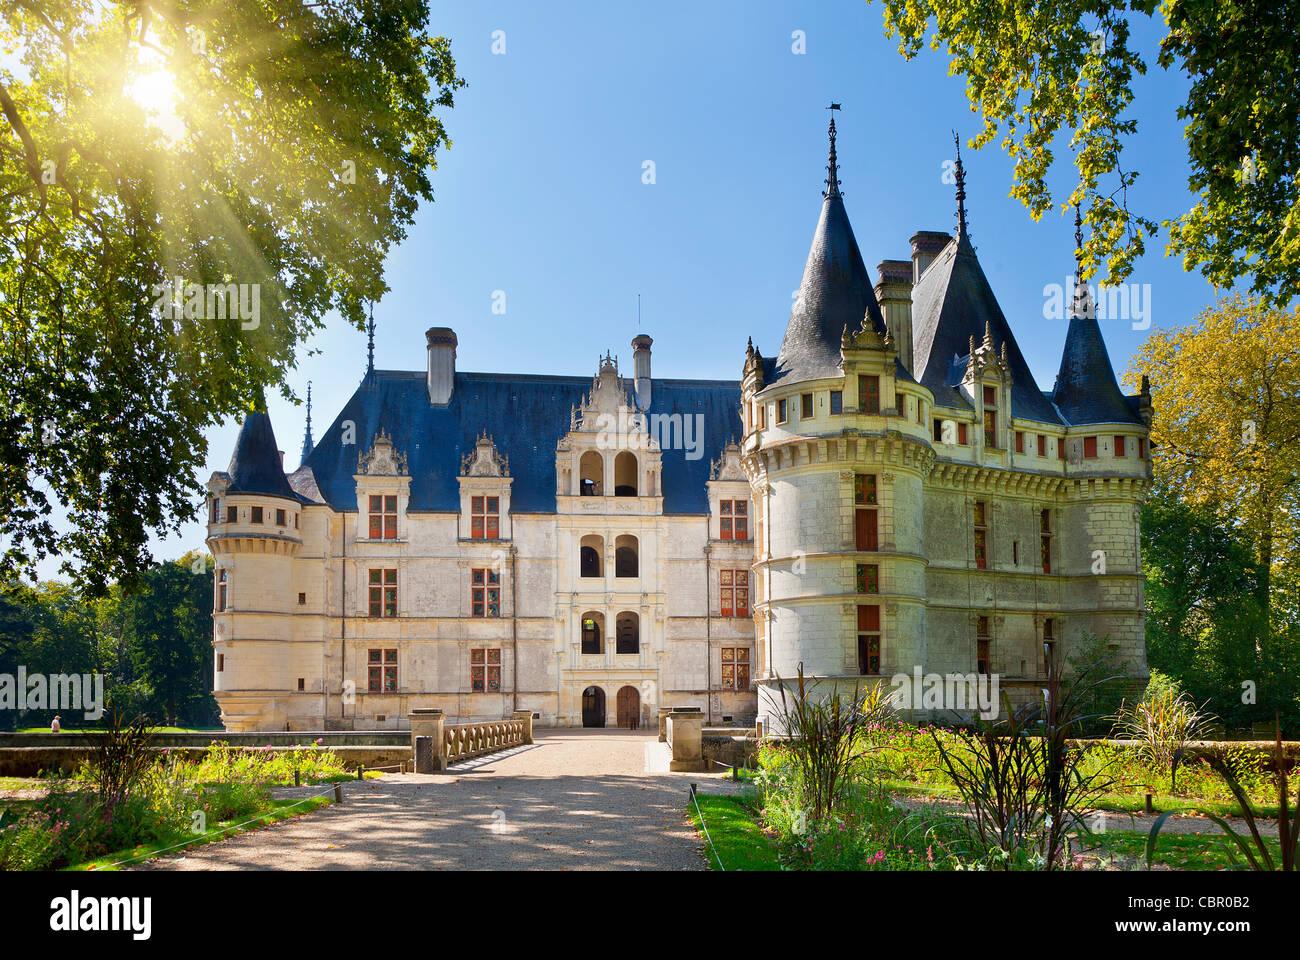 Loire Valley, Azay le Rideau Castle - Stock Image